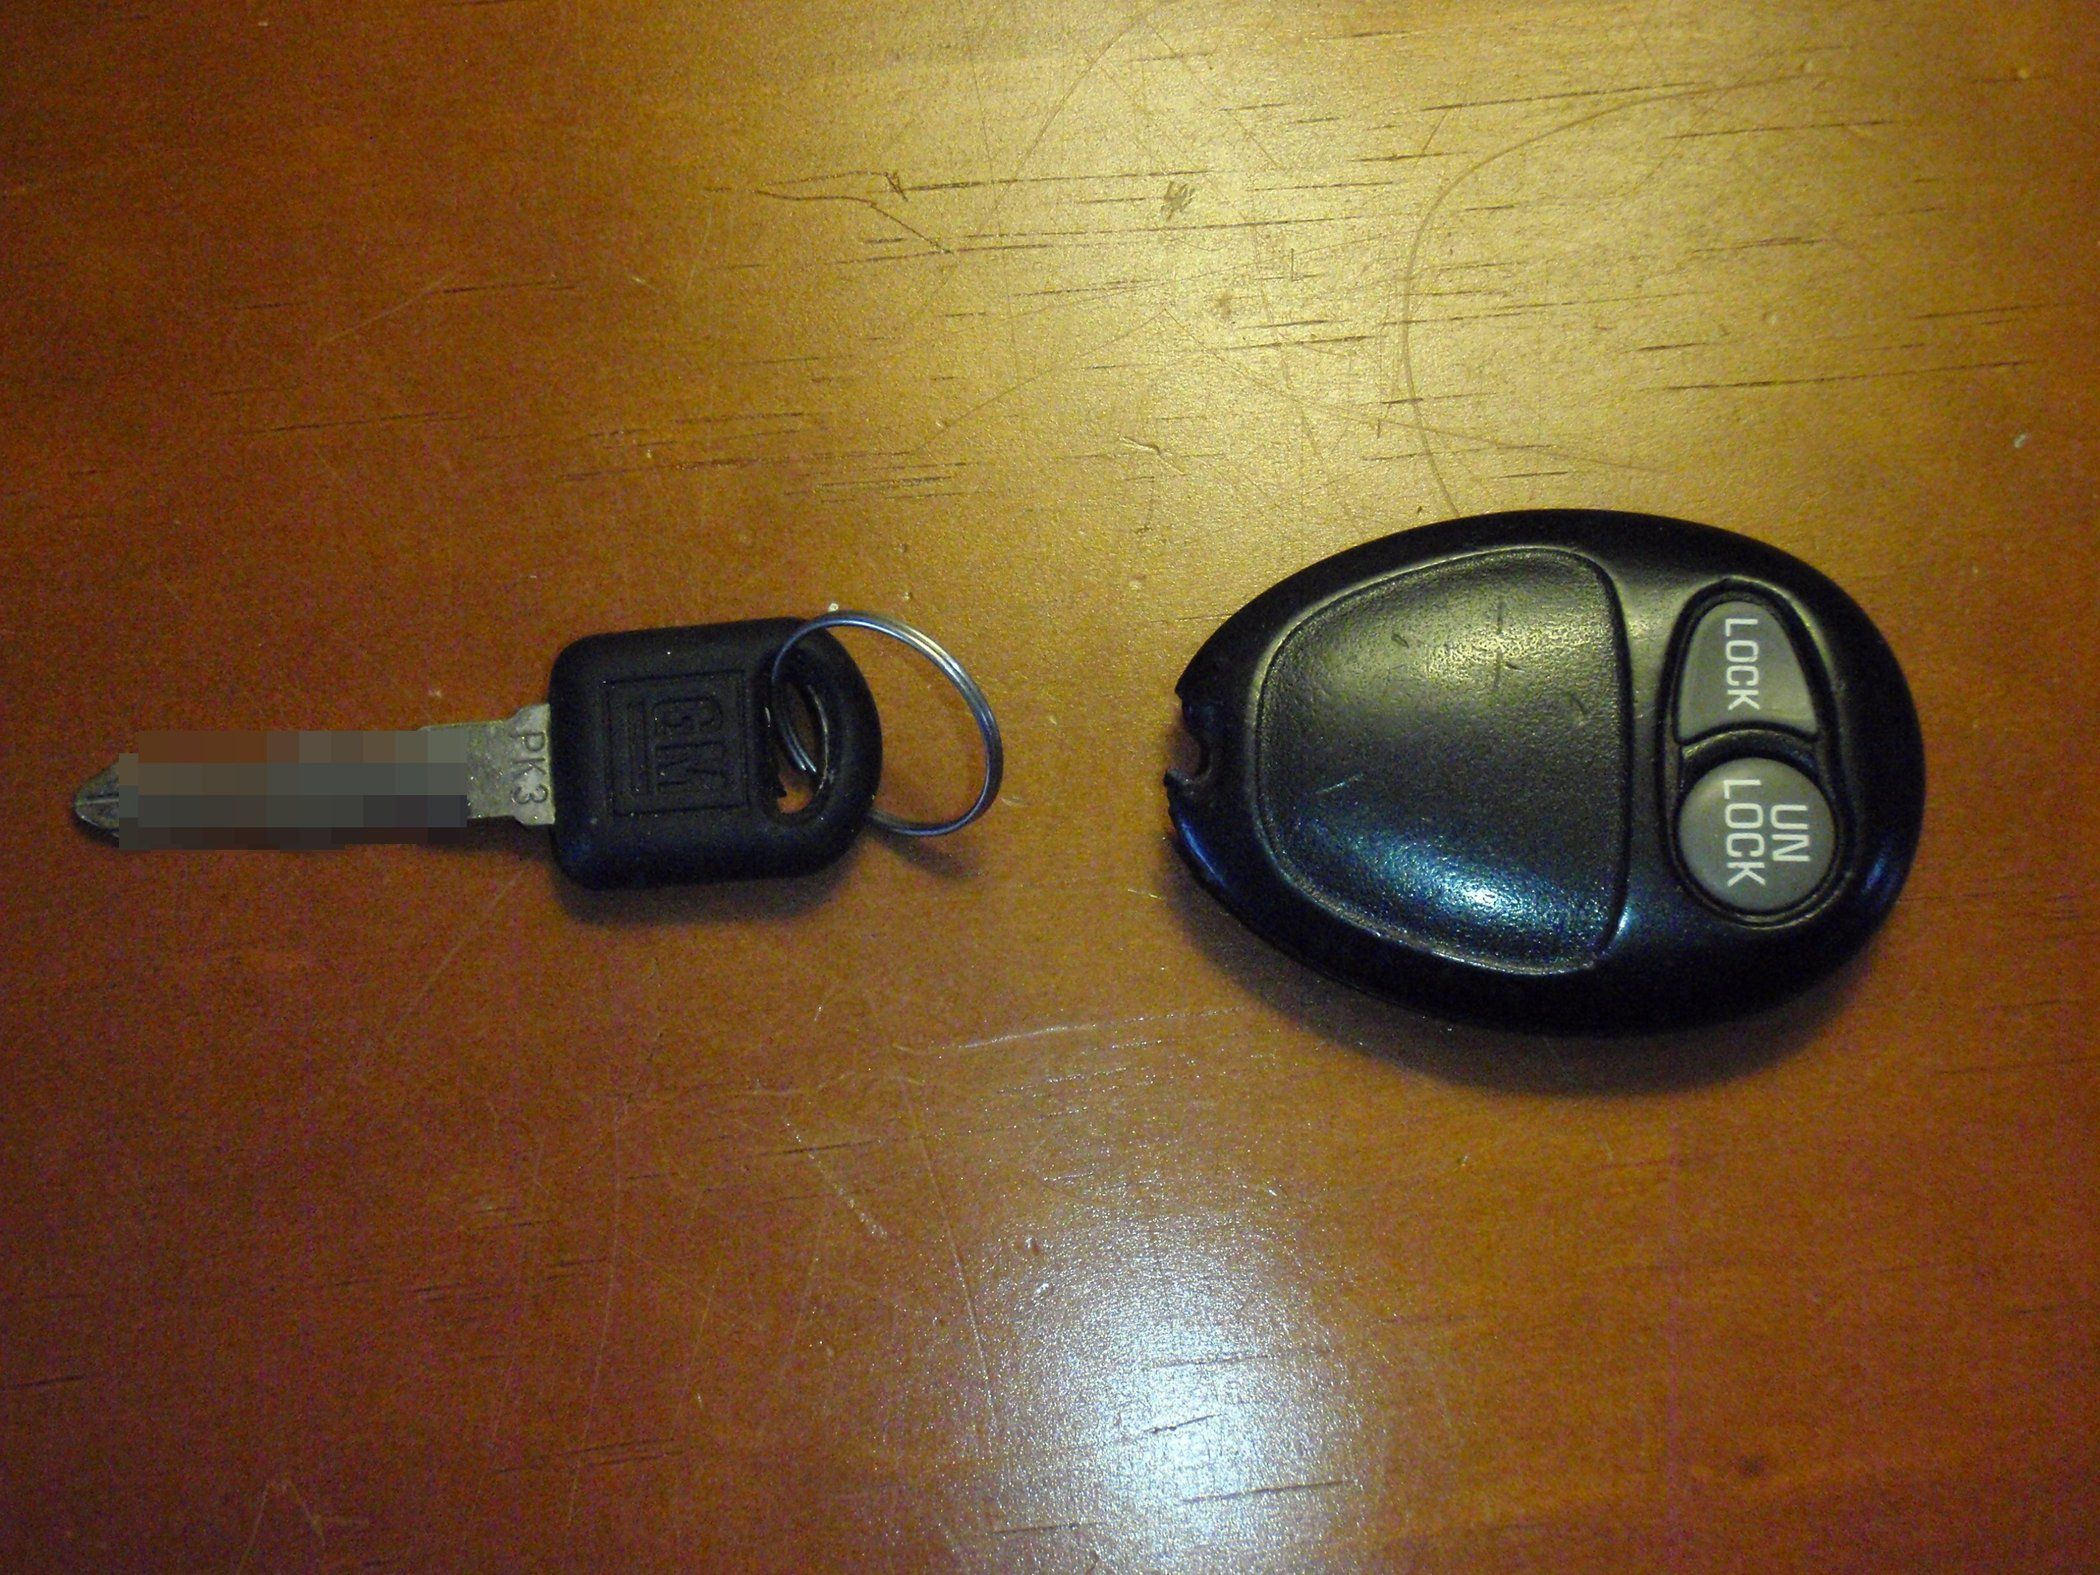 How To Fix A Broken Gm Key Fob With Images Key Fobs Diy Key Diy